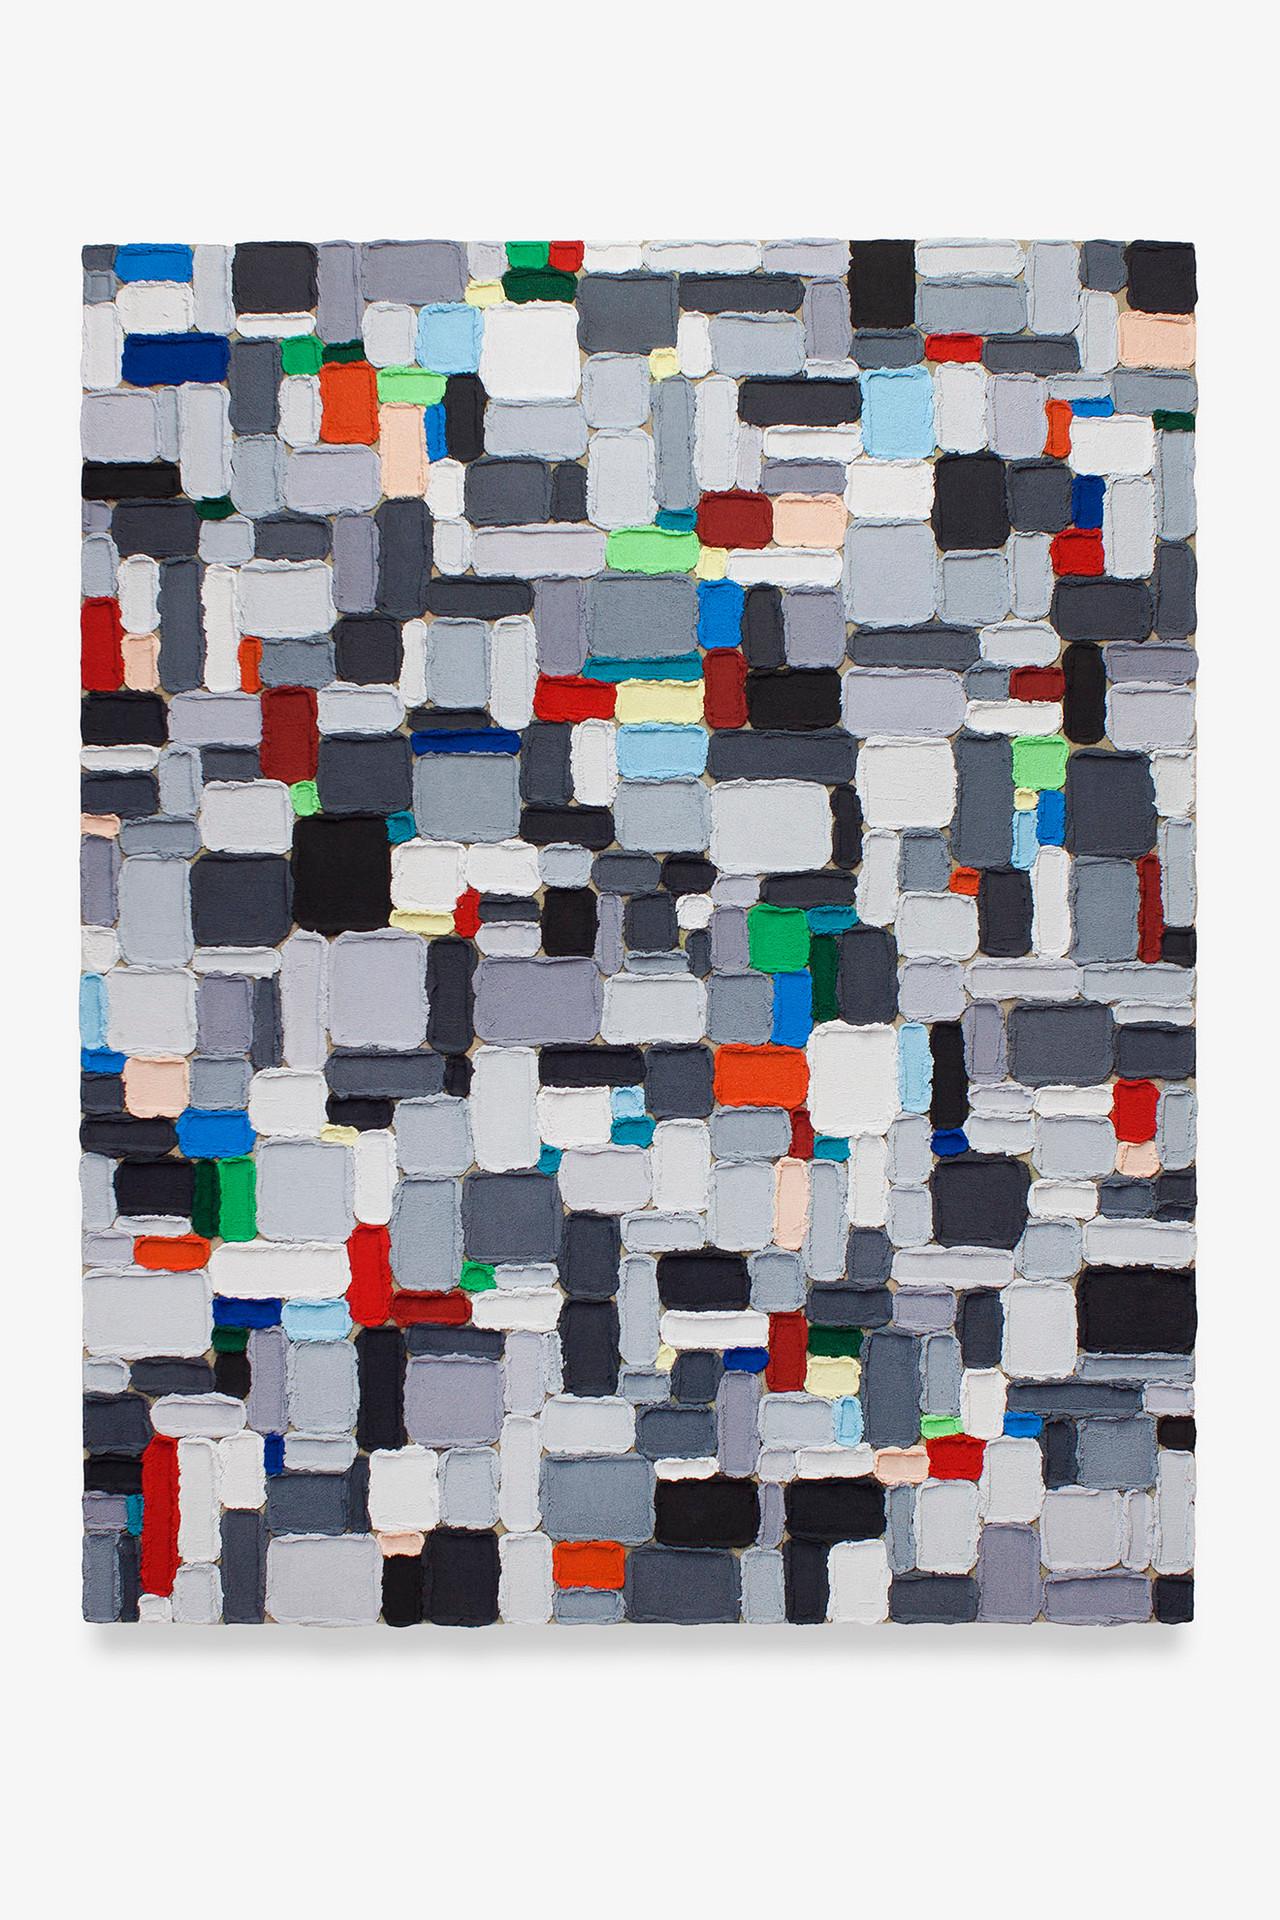 M06 (Masas), 2019. Acrylic, sand and limestone on linen. 146 x 114 cm.